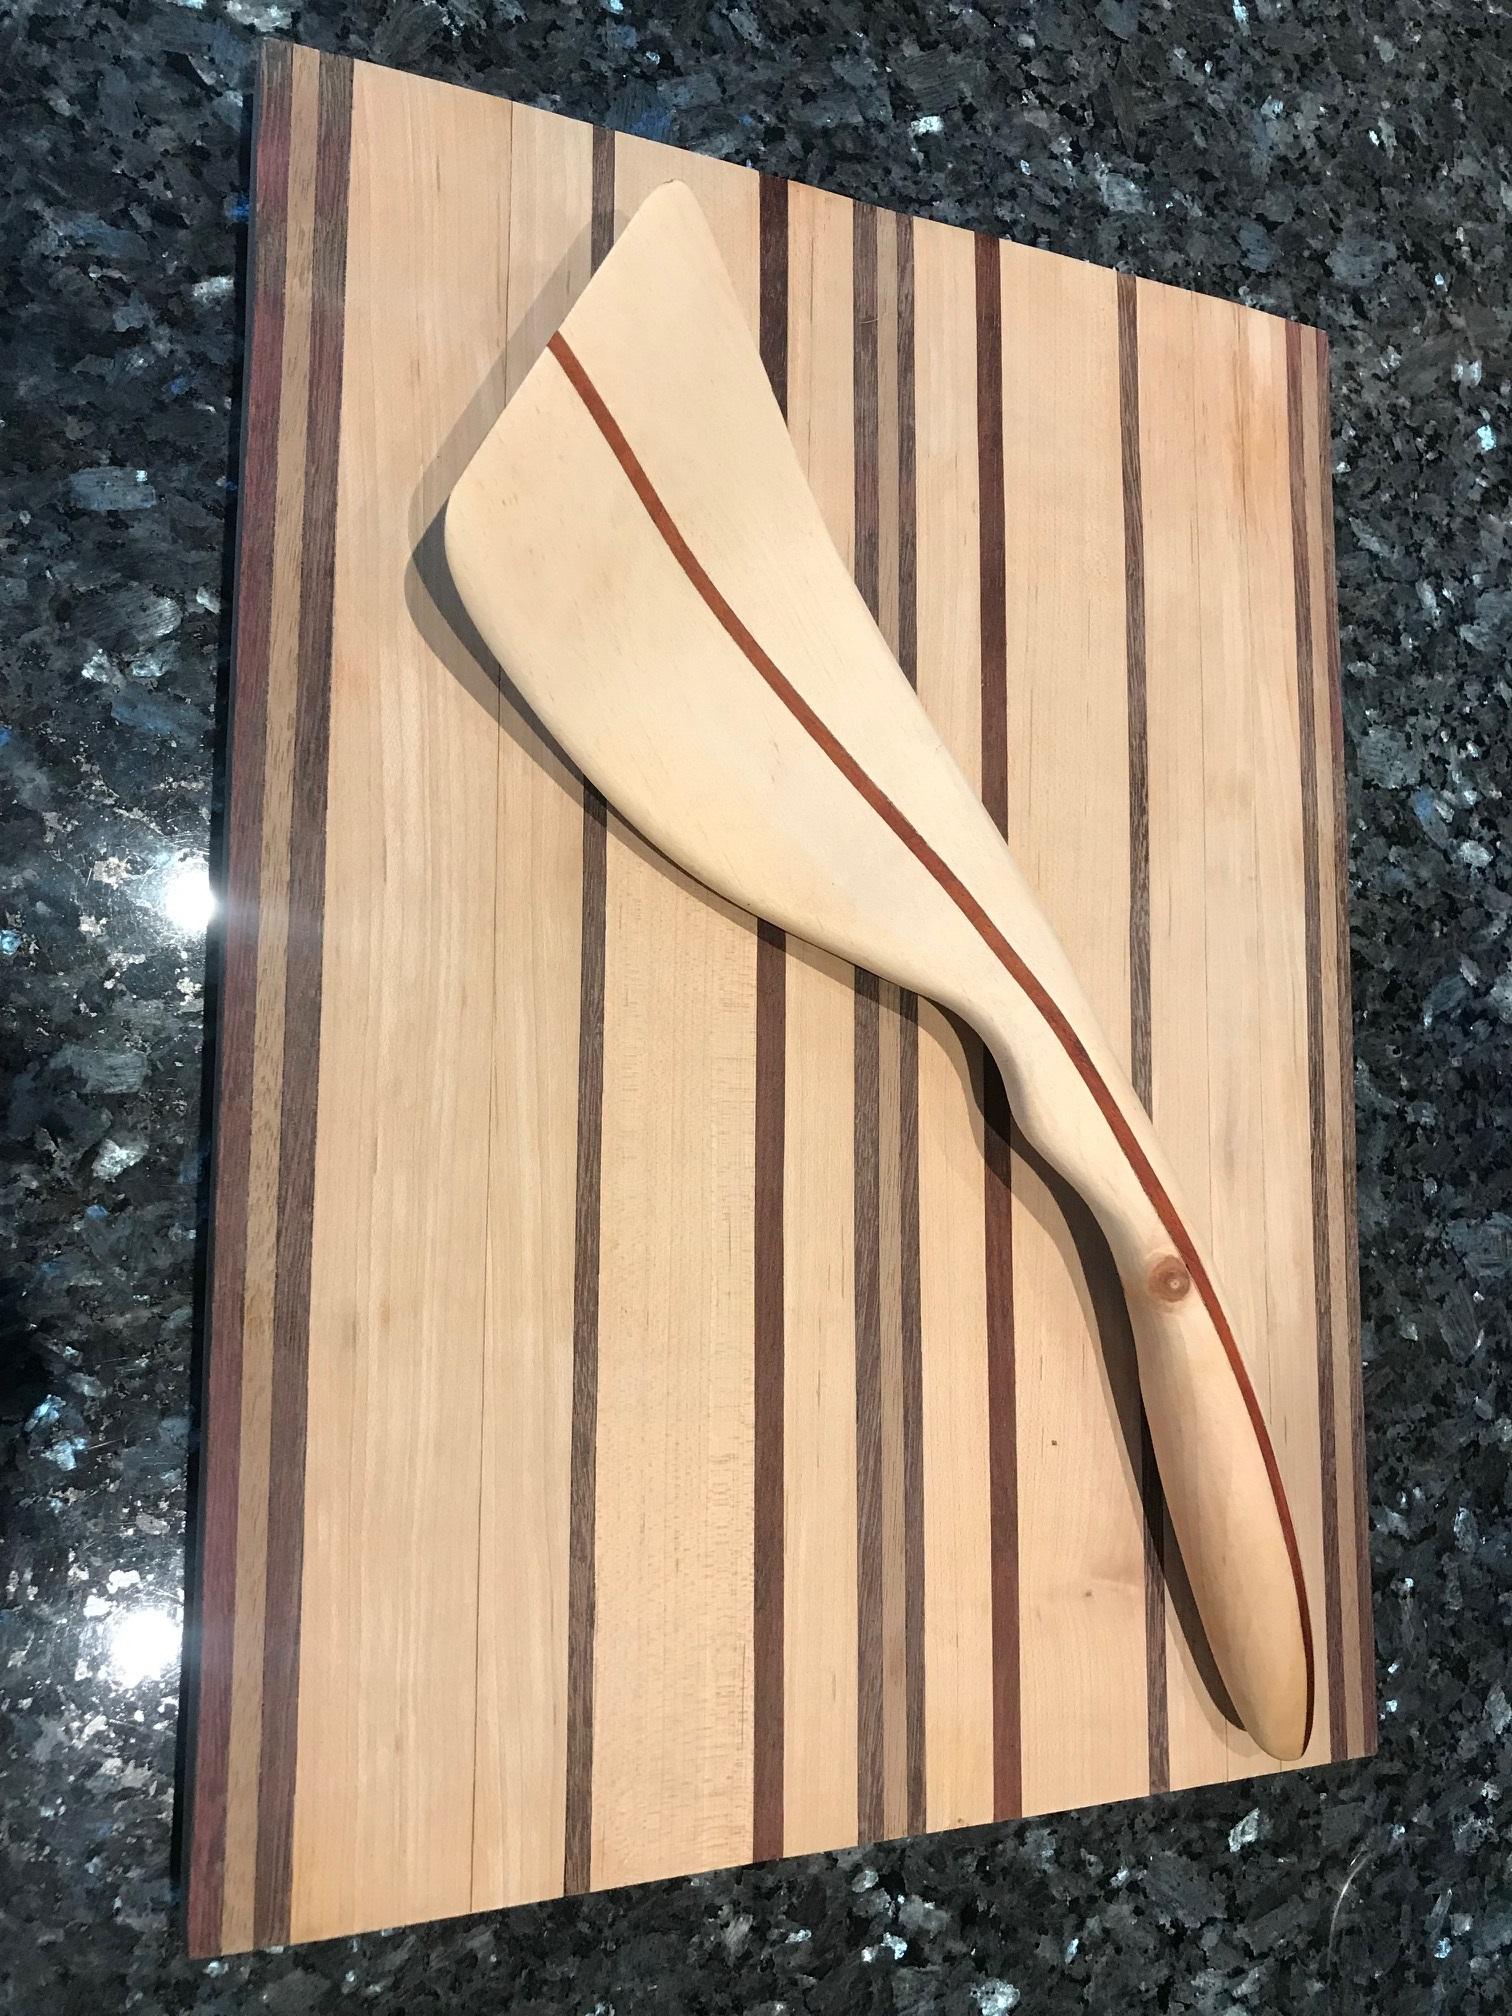 Riley Garner   Exotic Ergonomic Spatula  Blood Wood and Pine  and Cutting Board   Ash Maple Walnut Blood wood.jpg